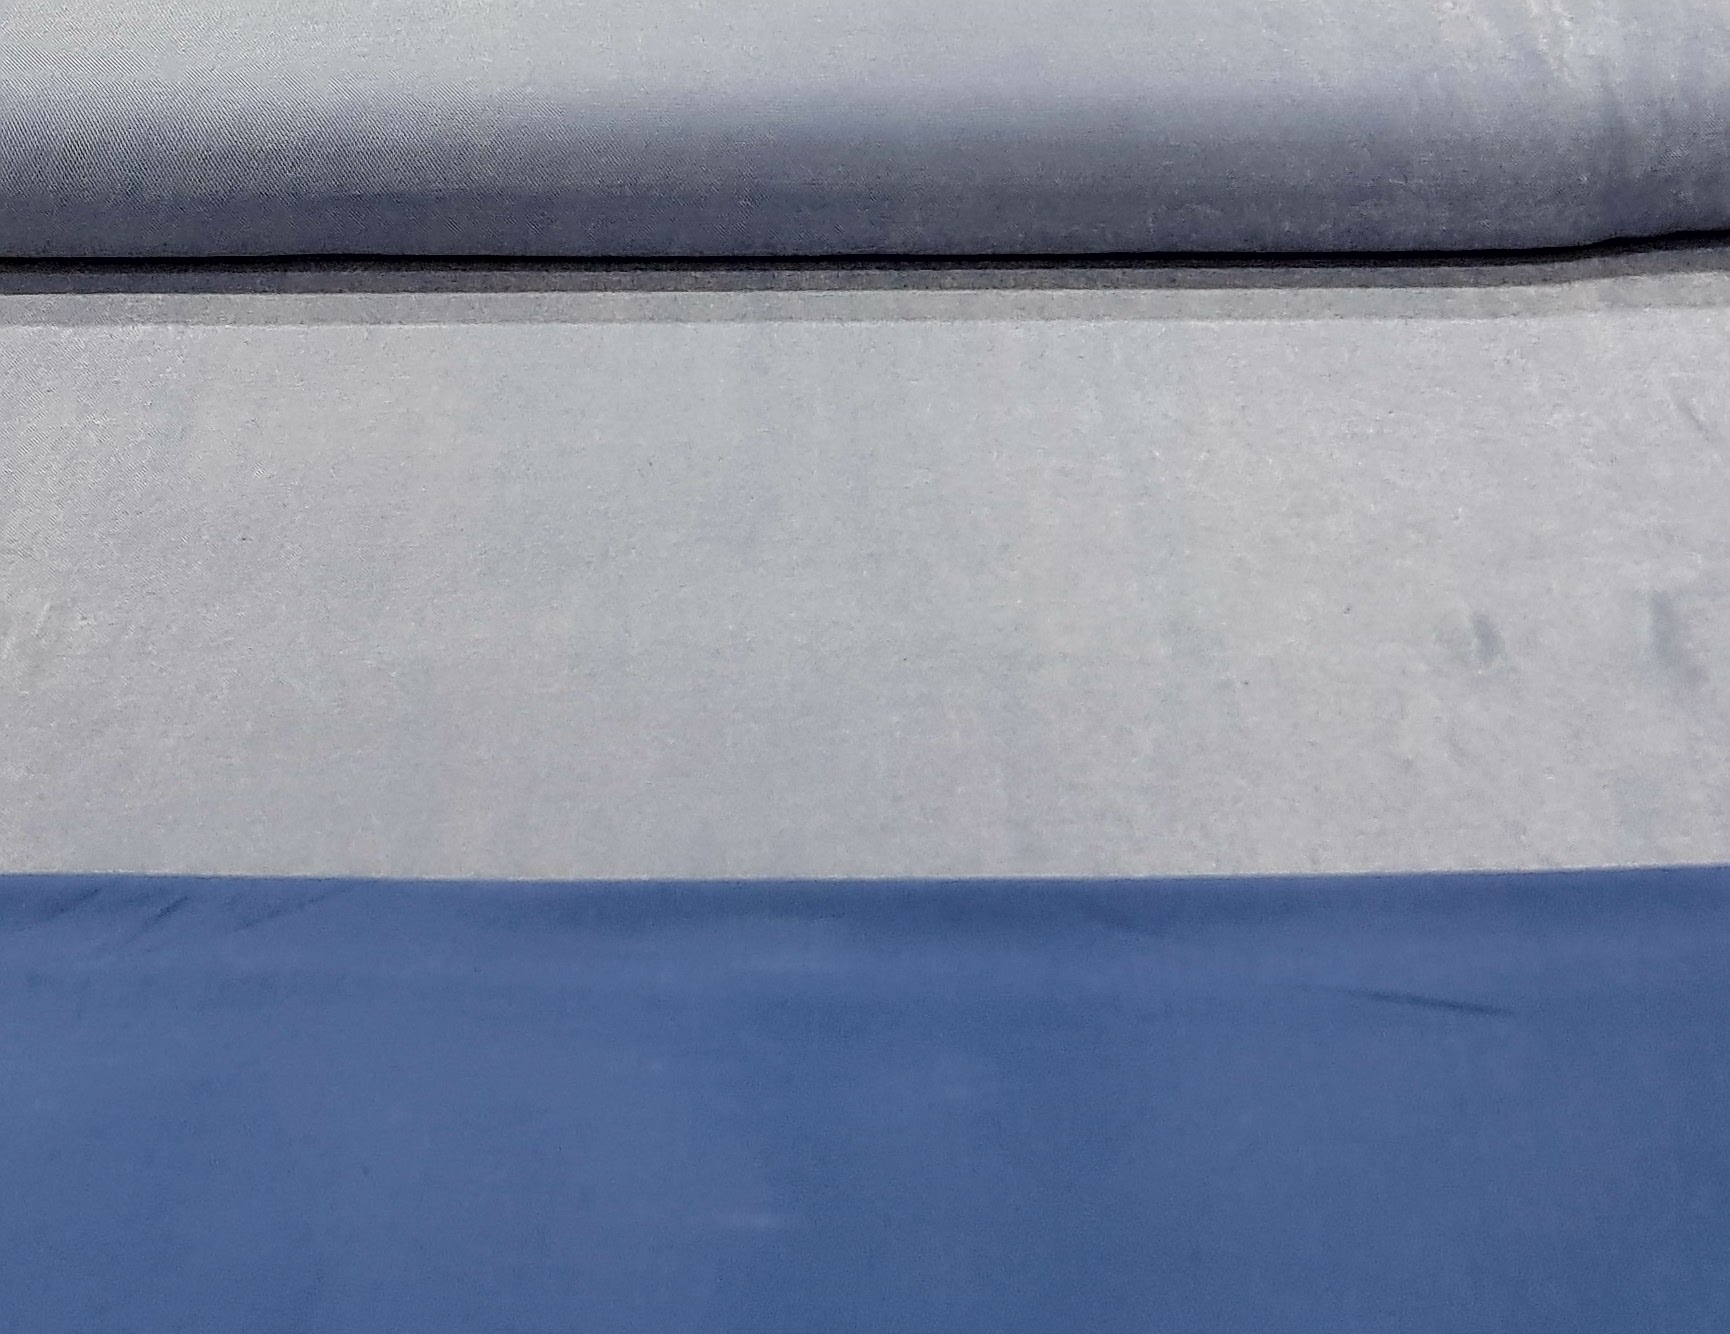 denimtricotijsblauw